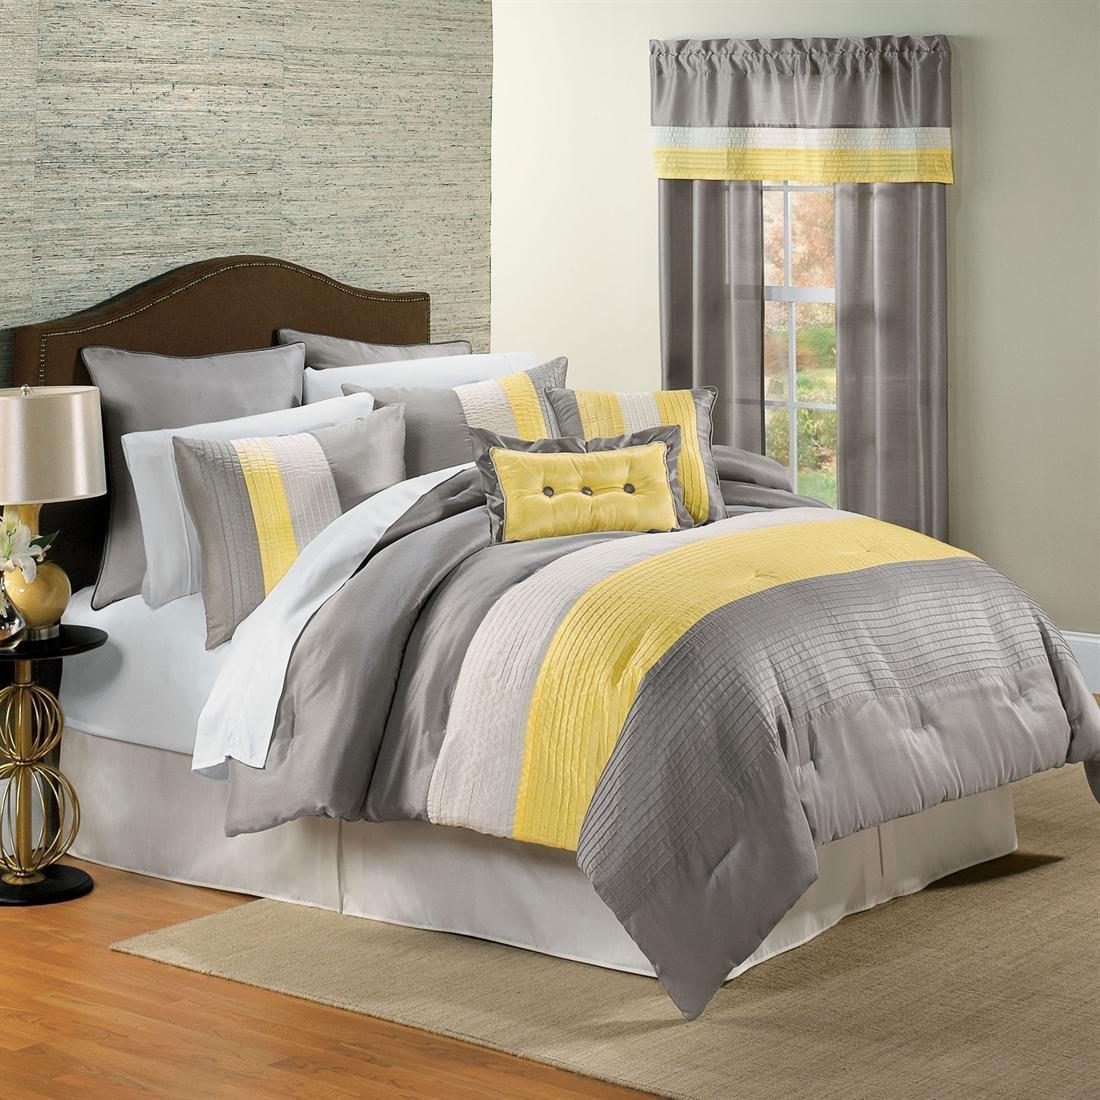 Grey King Size Bedding Ideas – HomesFeed